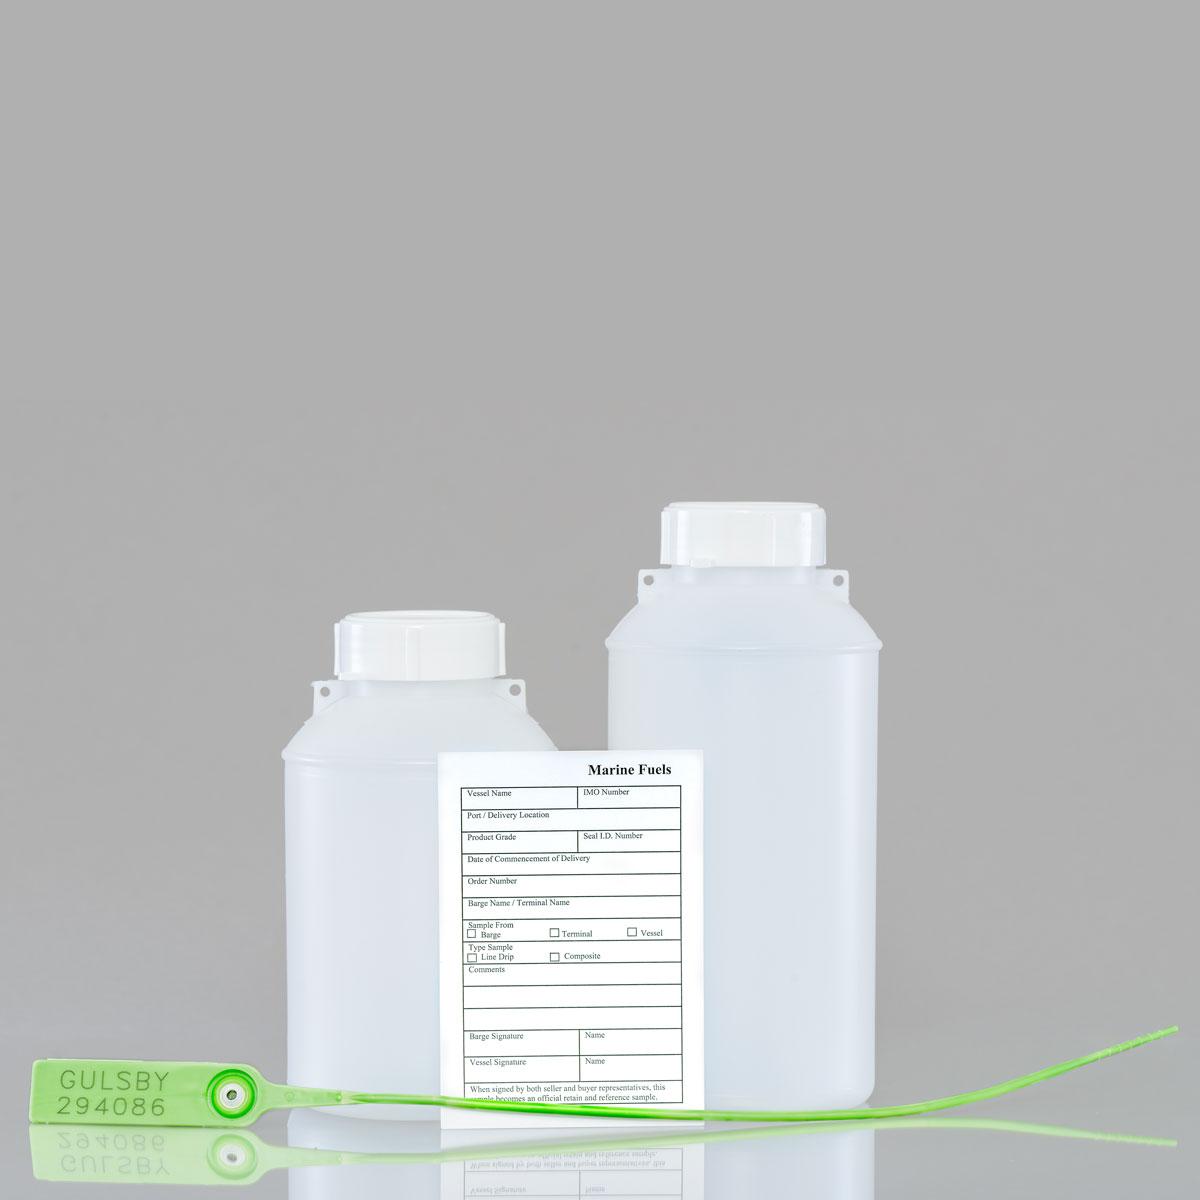 http://fuelsamplebottles.com/wp-content/uploads/gulsby-packaging-016-1200x.jpg